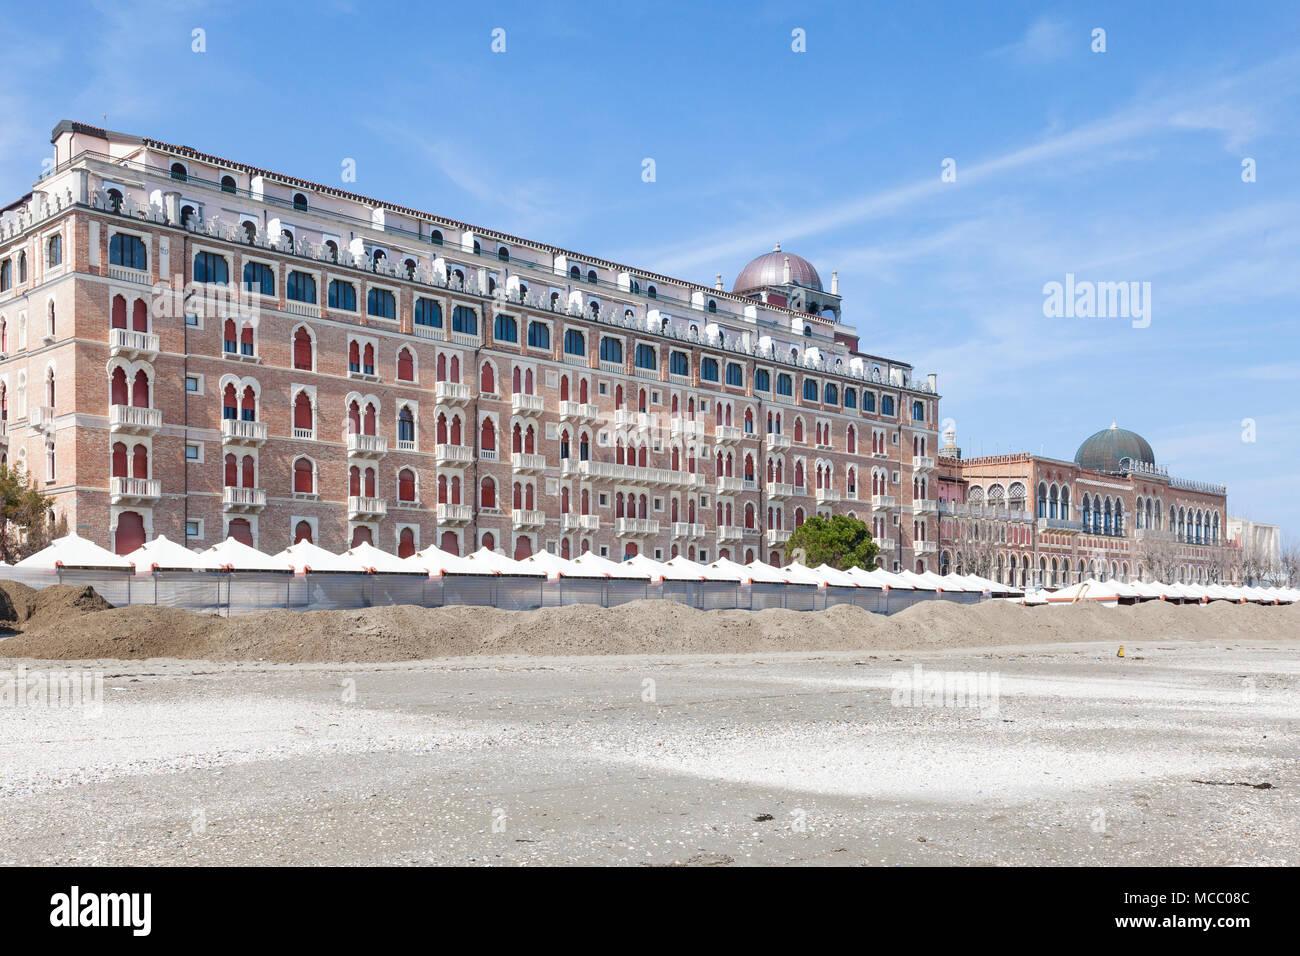 Excelsior Hotel Venezia